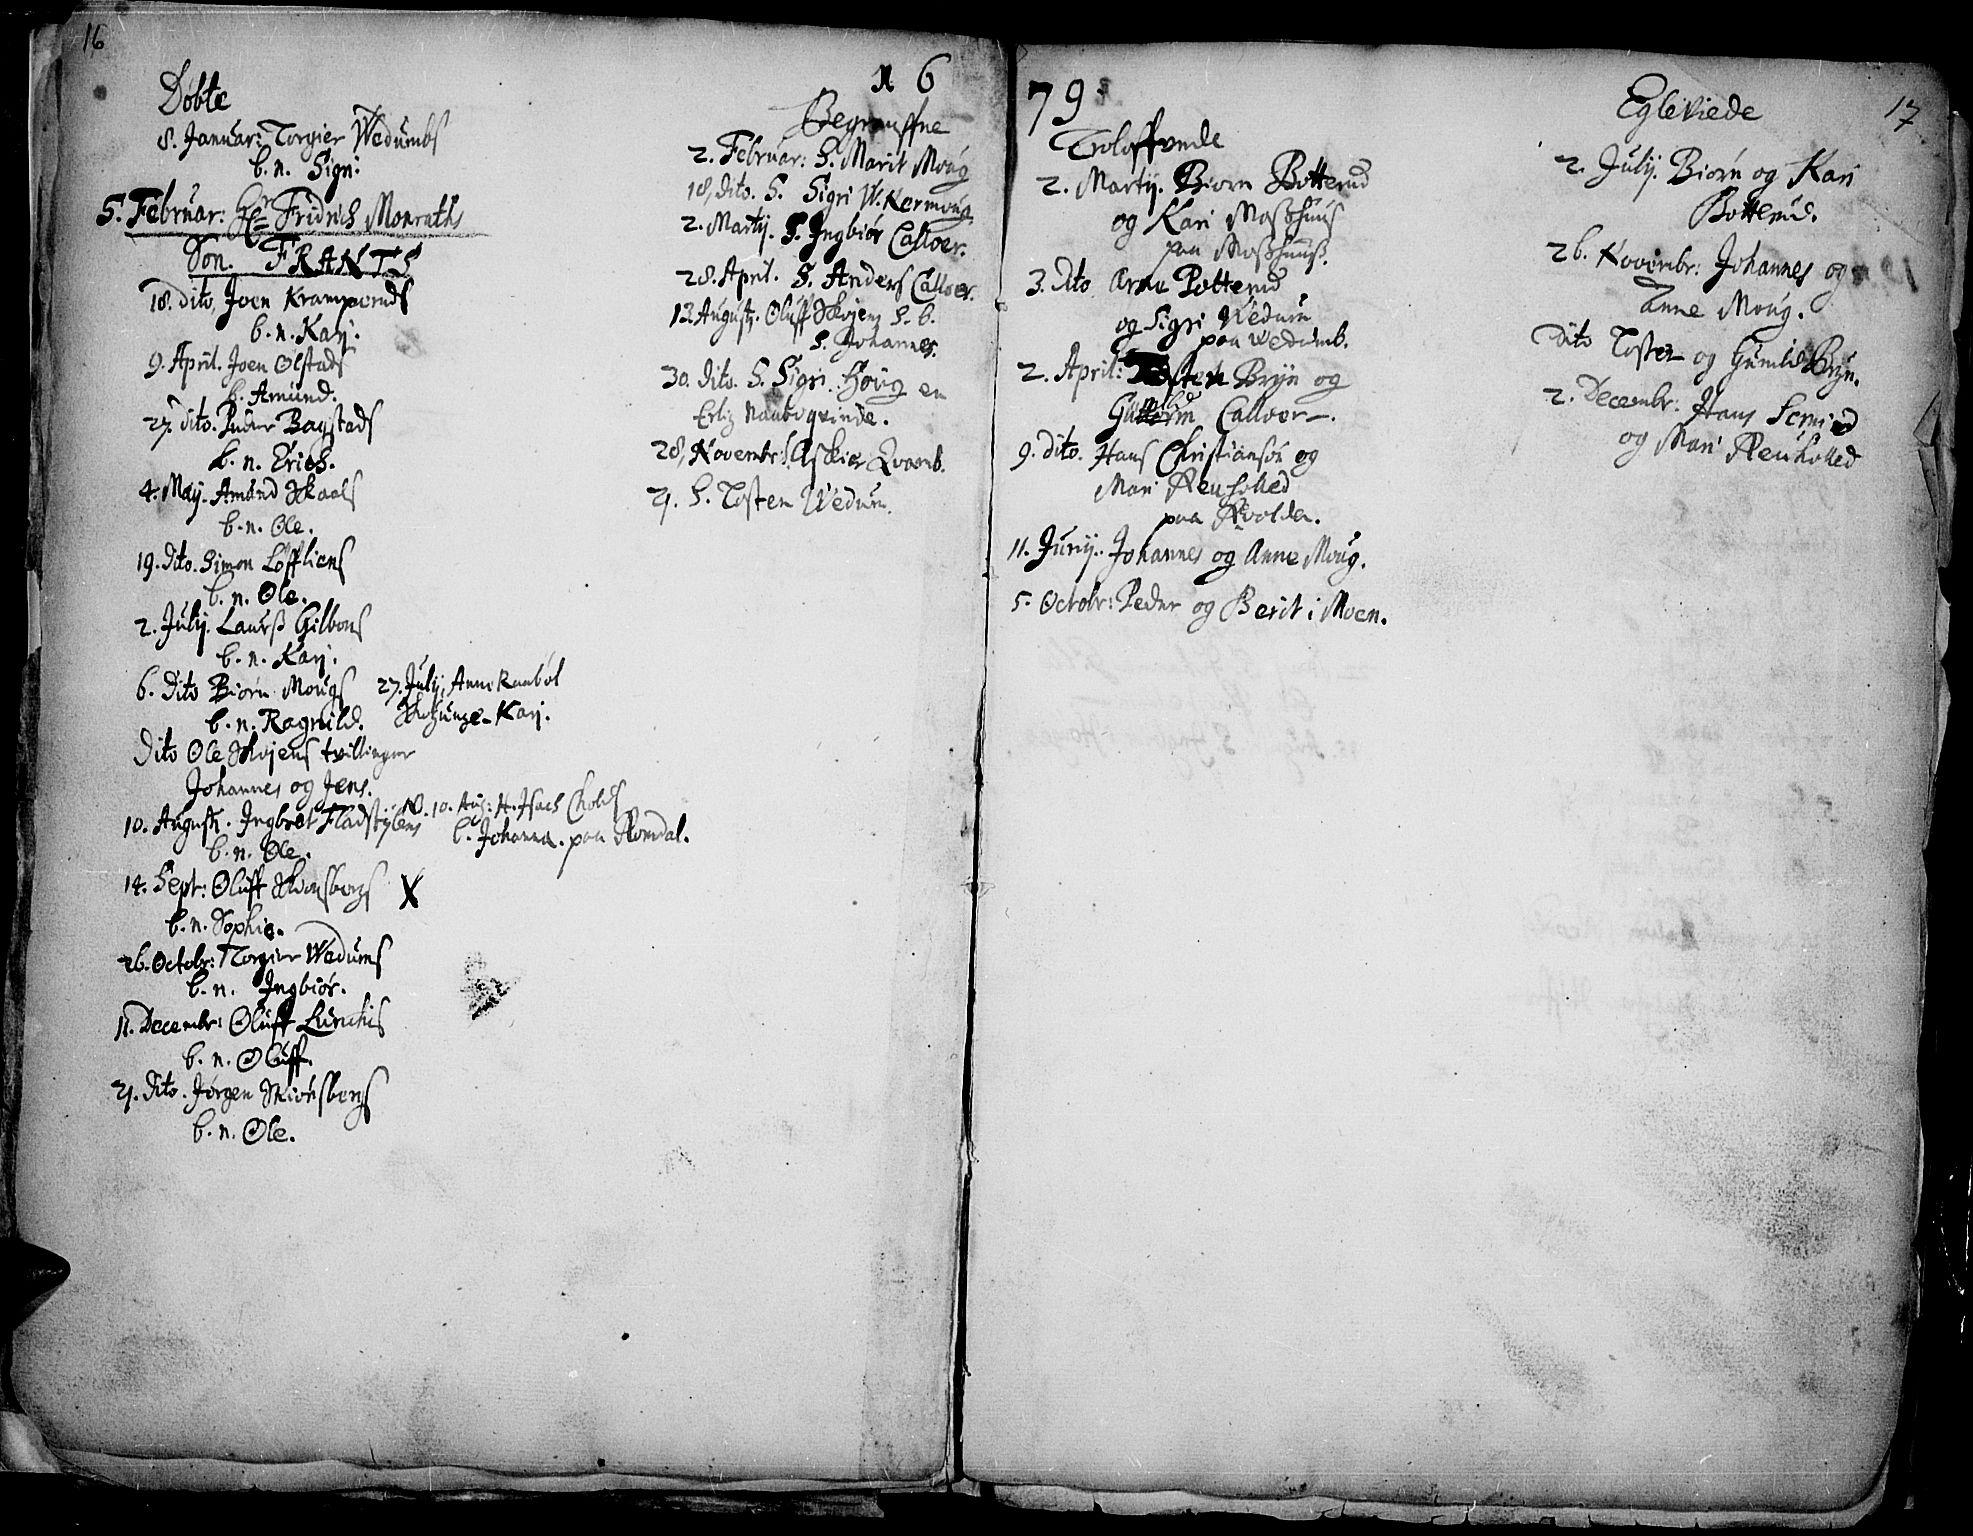 SAH, Øyer prestekontor, Ministerialbok nr. 1, 1671-1727, s. 16-17